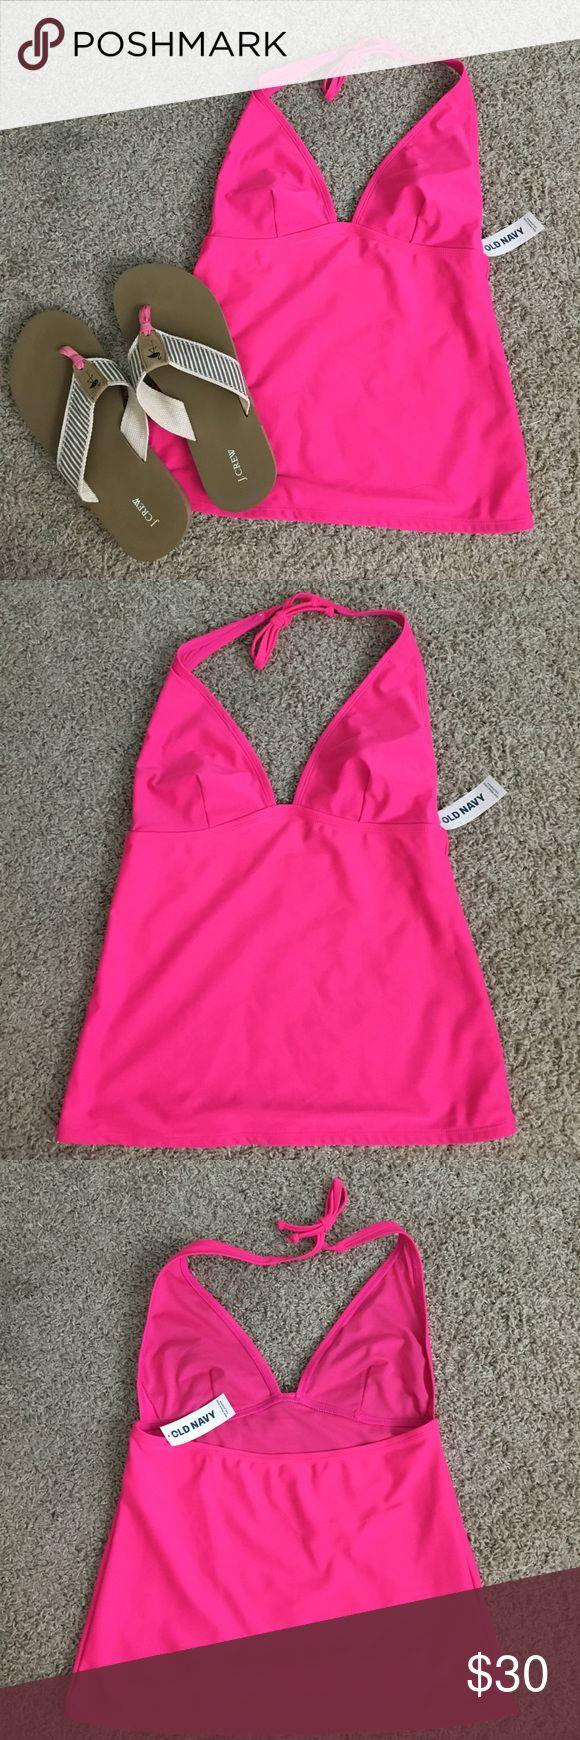 NWT Hot pink tankini Brand new. Never worn. Old Navy Swim